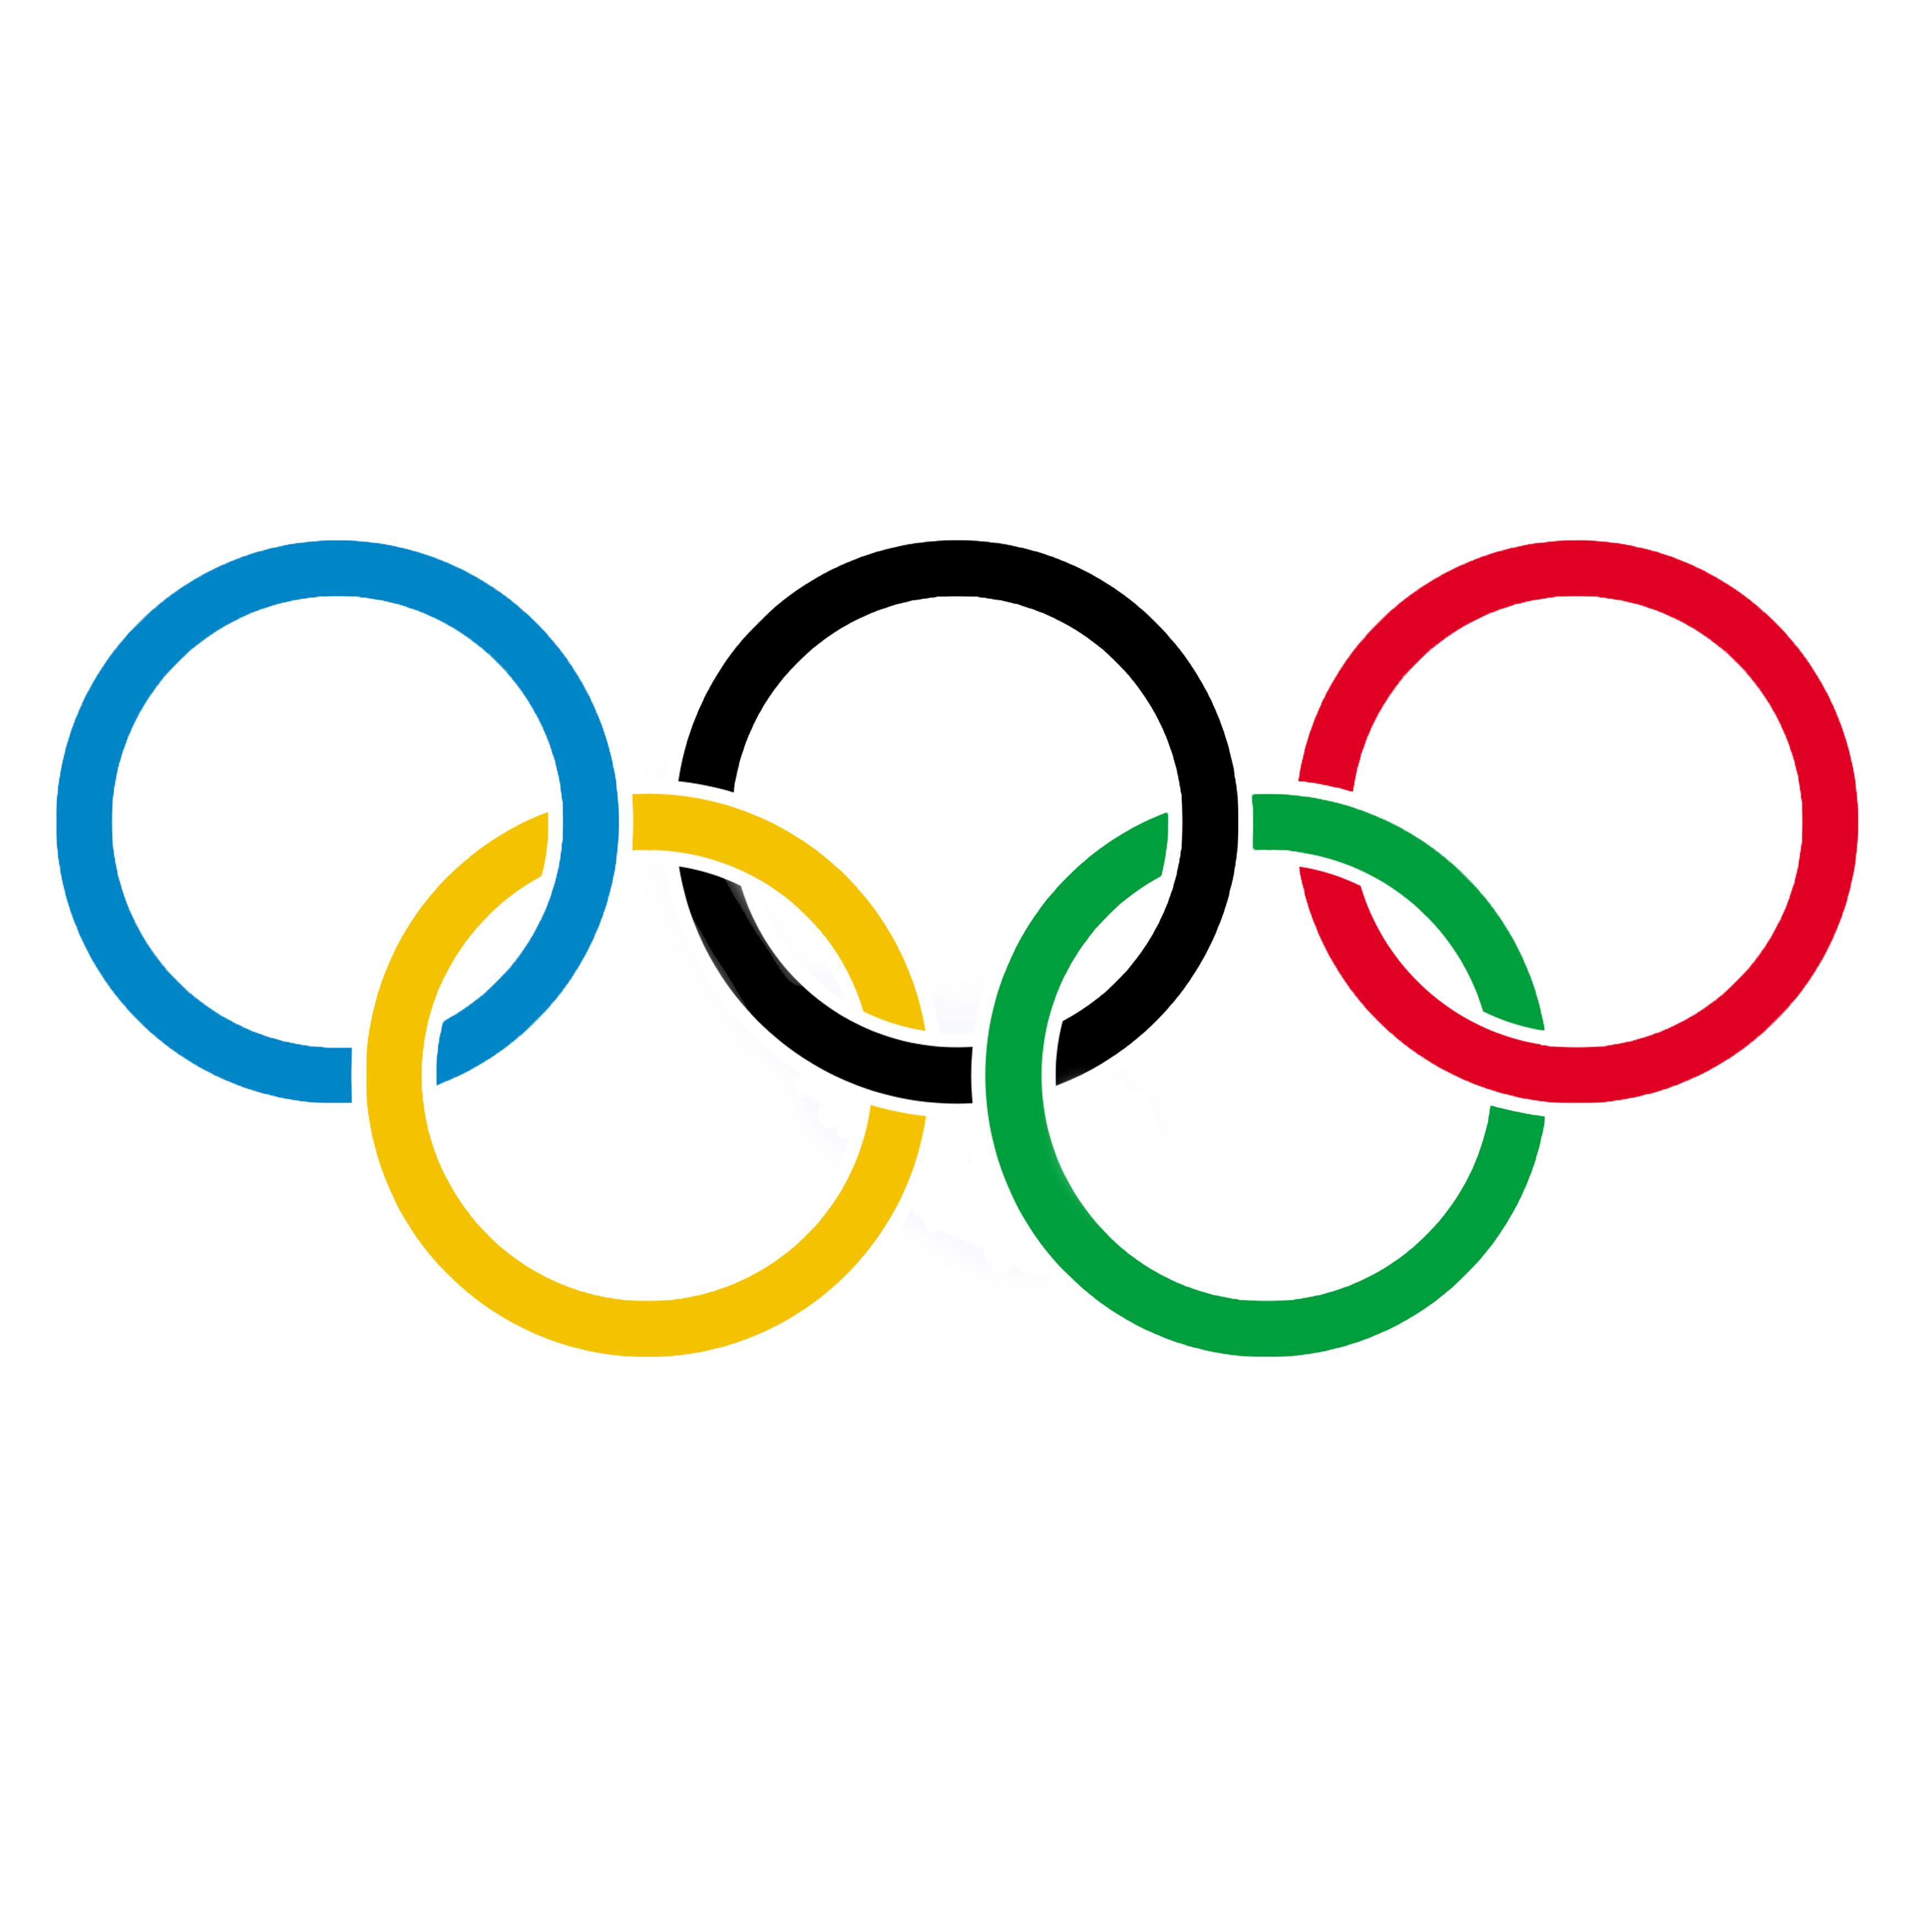 Olympische Ringe Bild, Clipart, Illustration